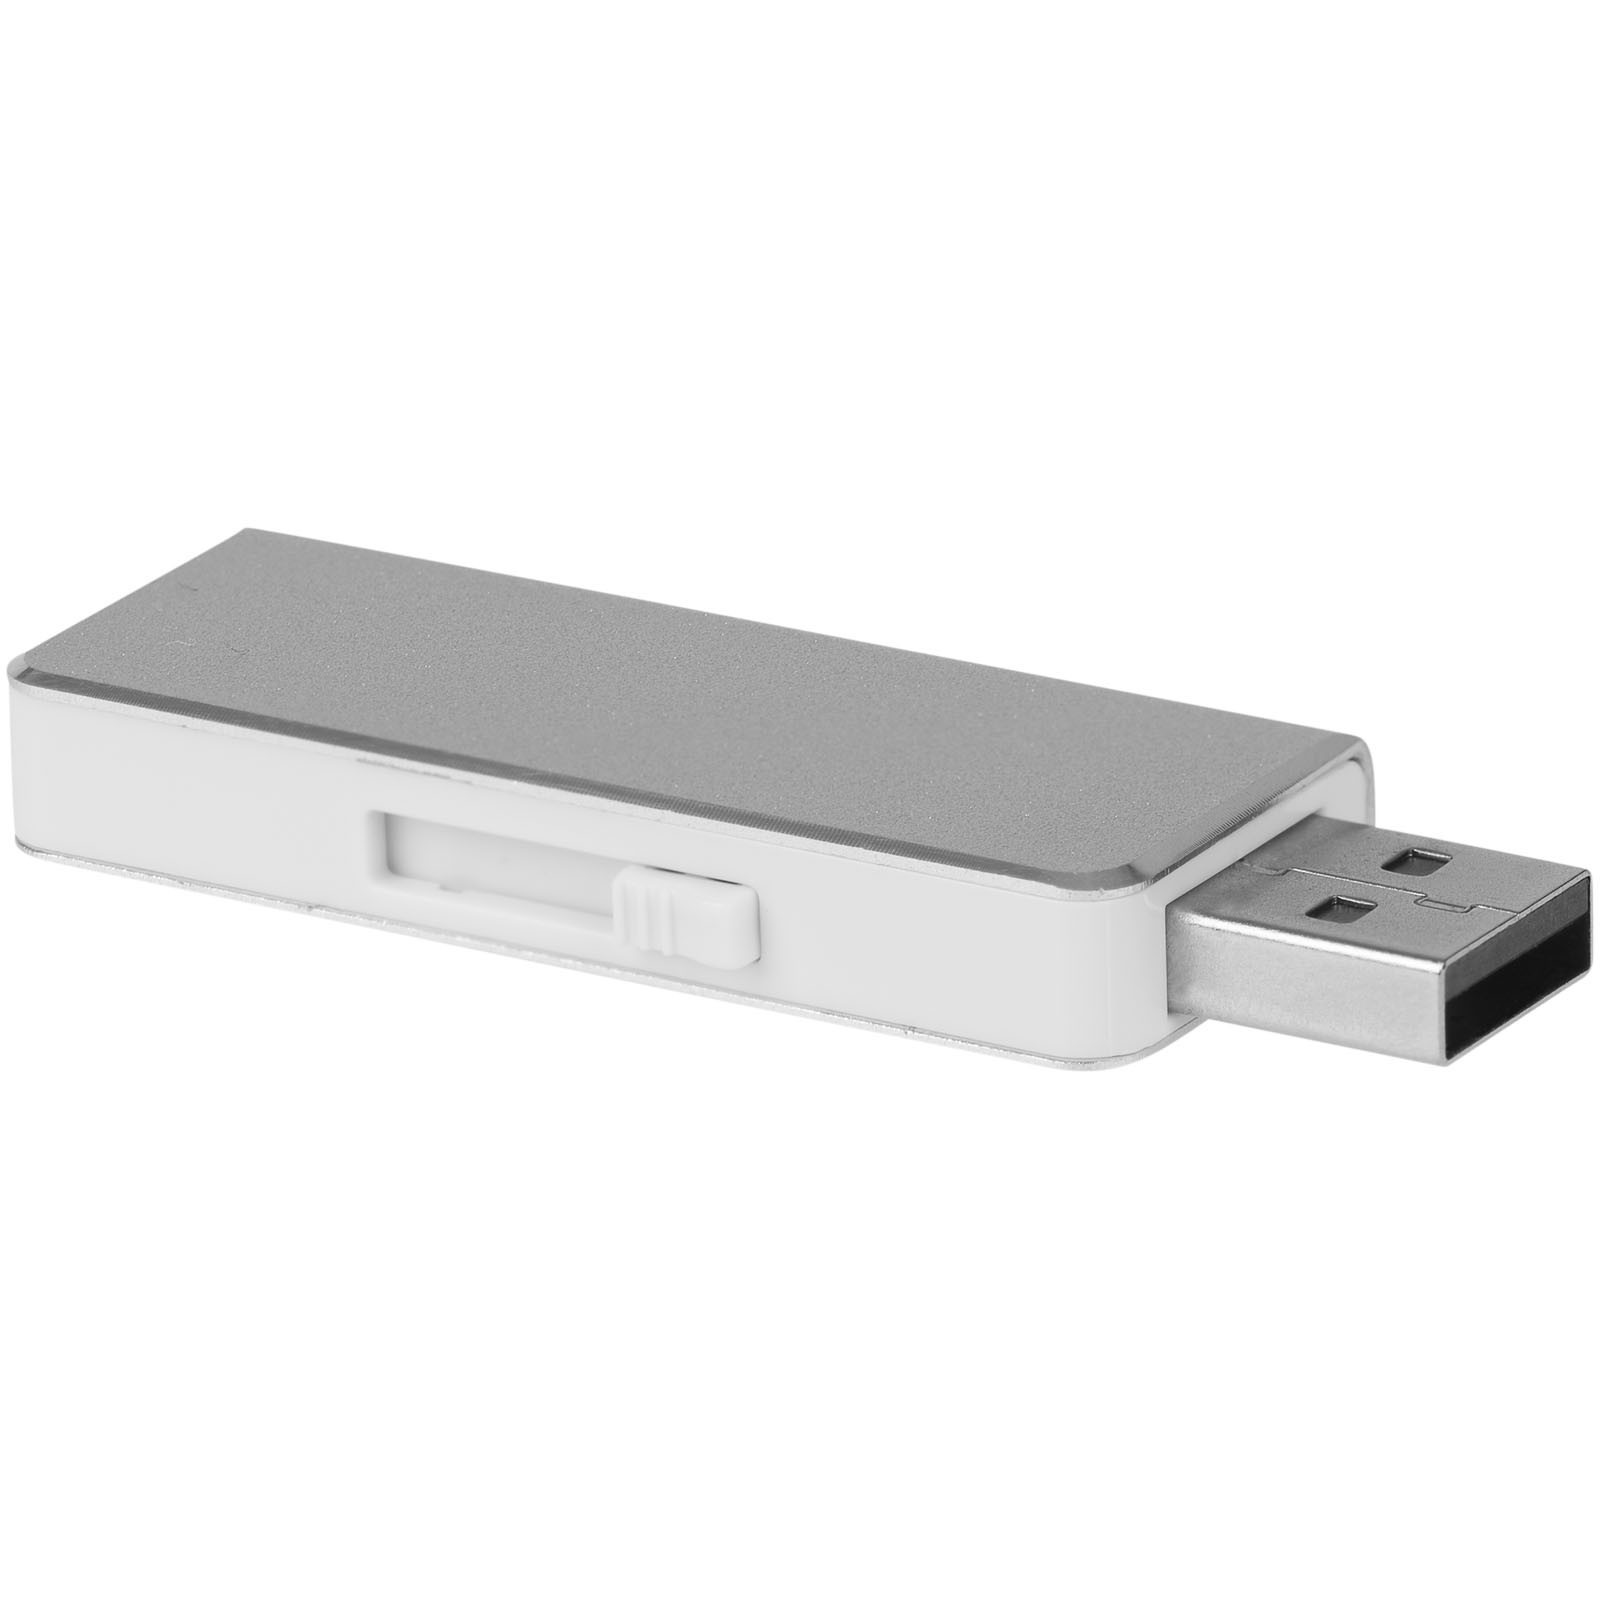 USB disk Glide 4 GB - Stříbrný